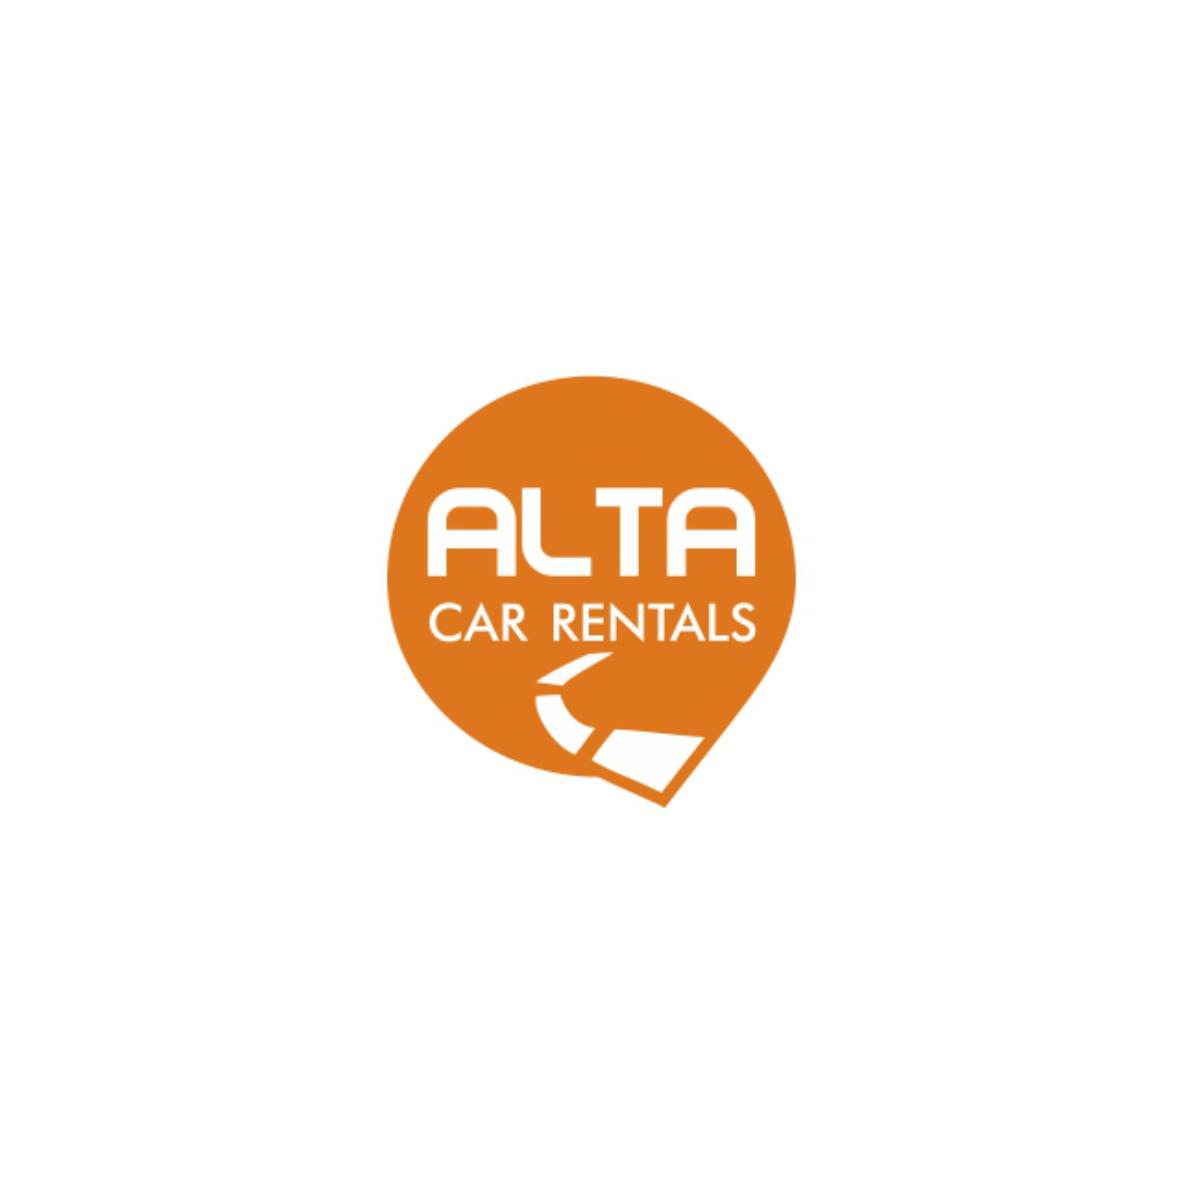 alta-logotipo